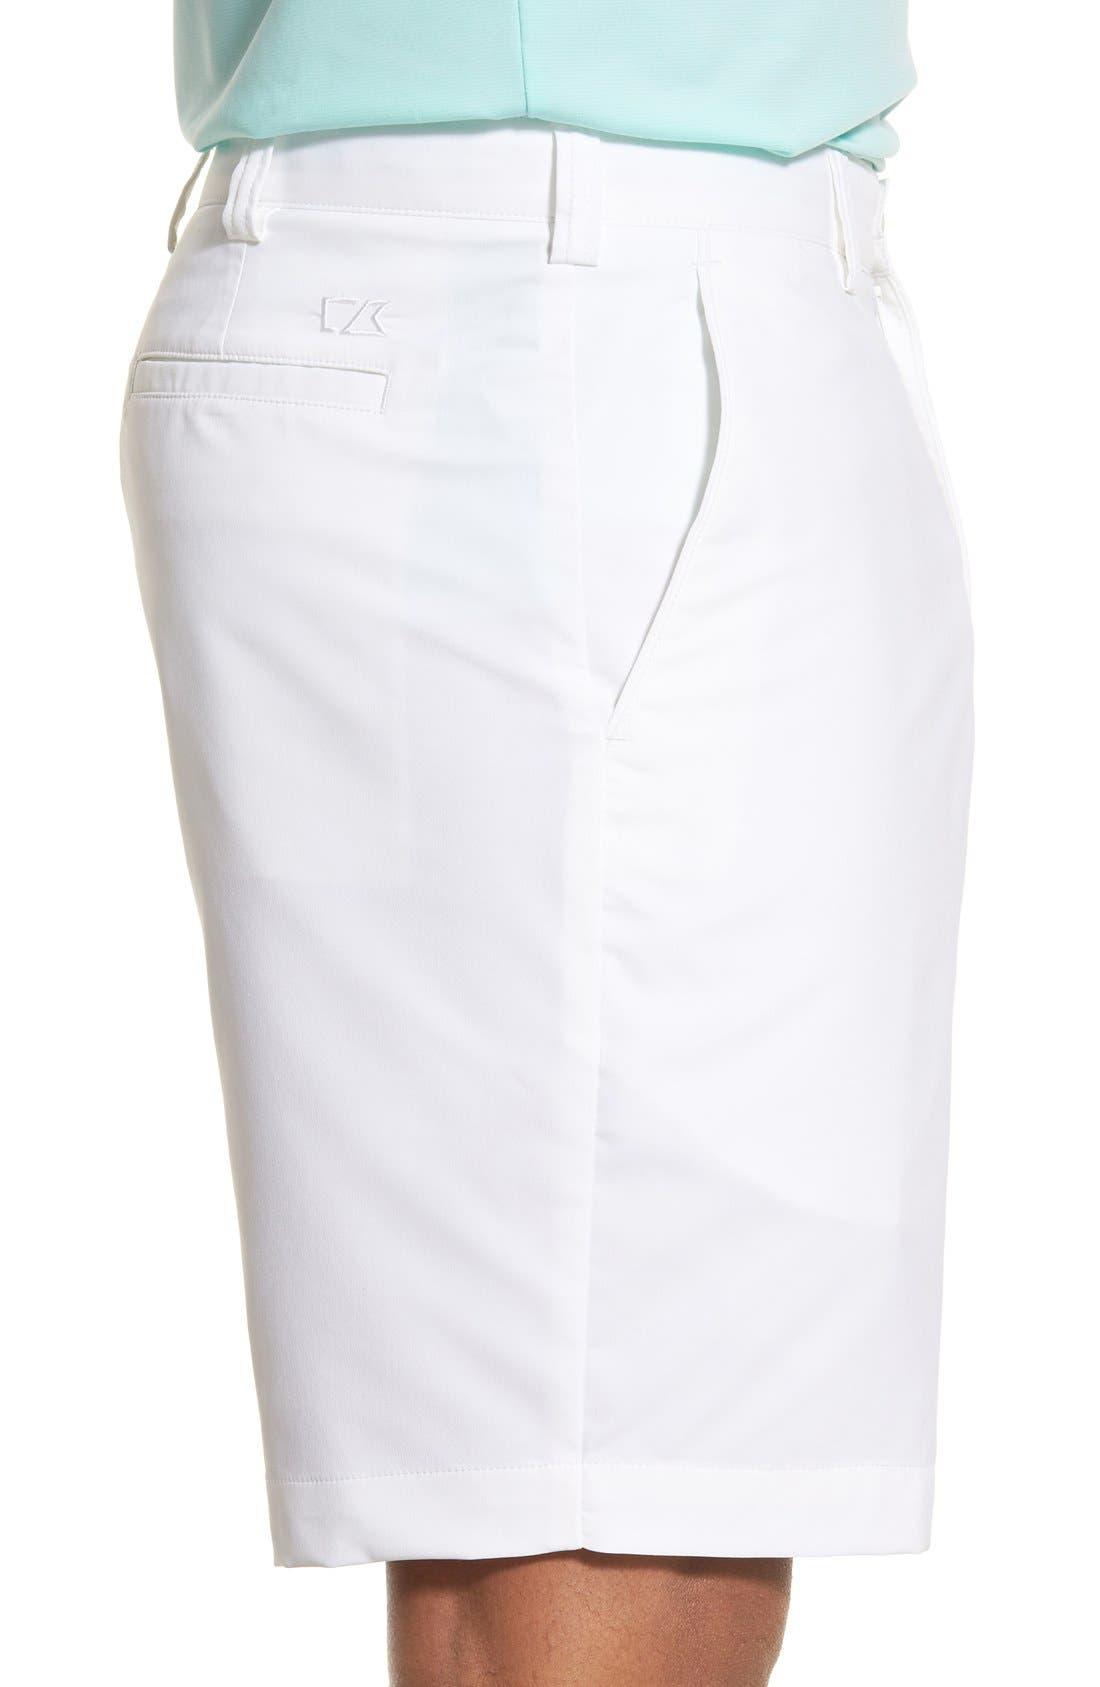 Bainbridge DryTec Flat Front Shorts,                             Alternate thumbnail 6, color,                             WHITE